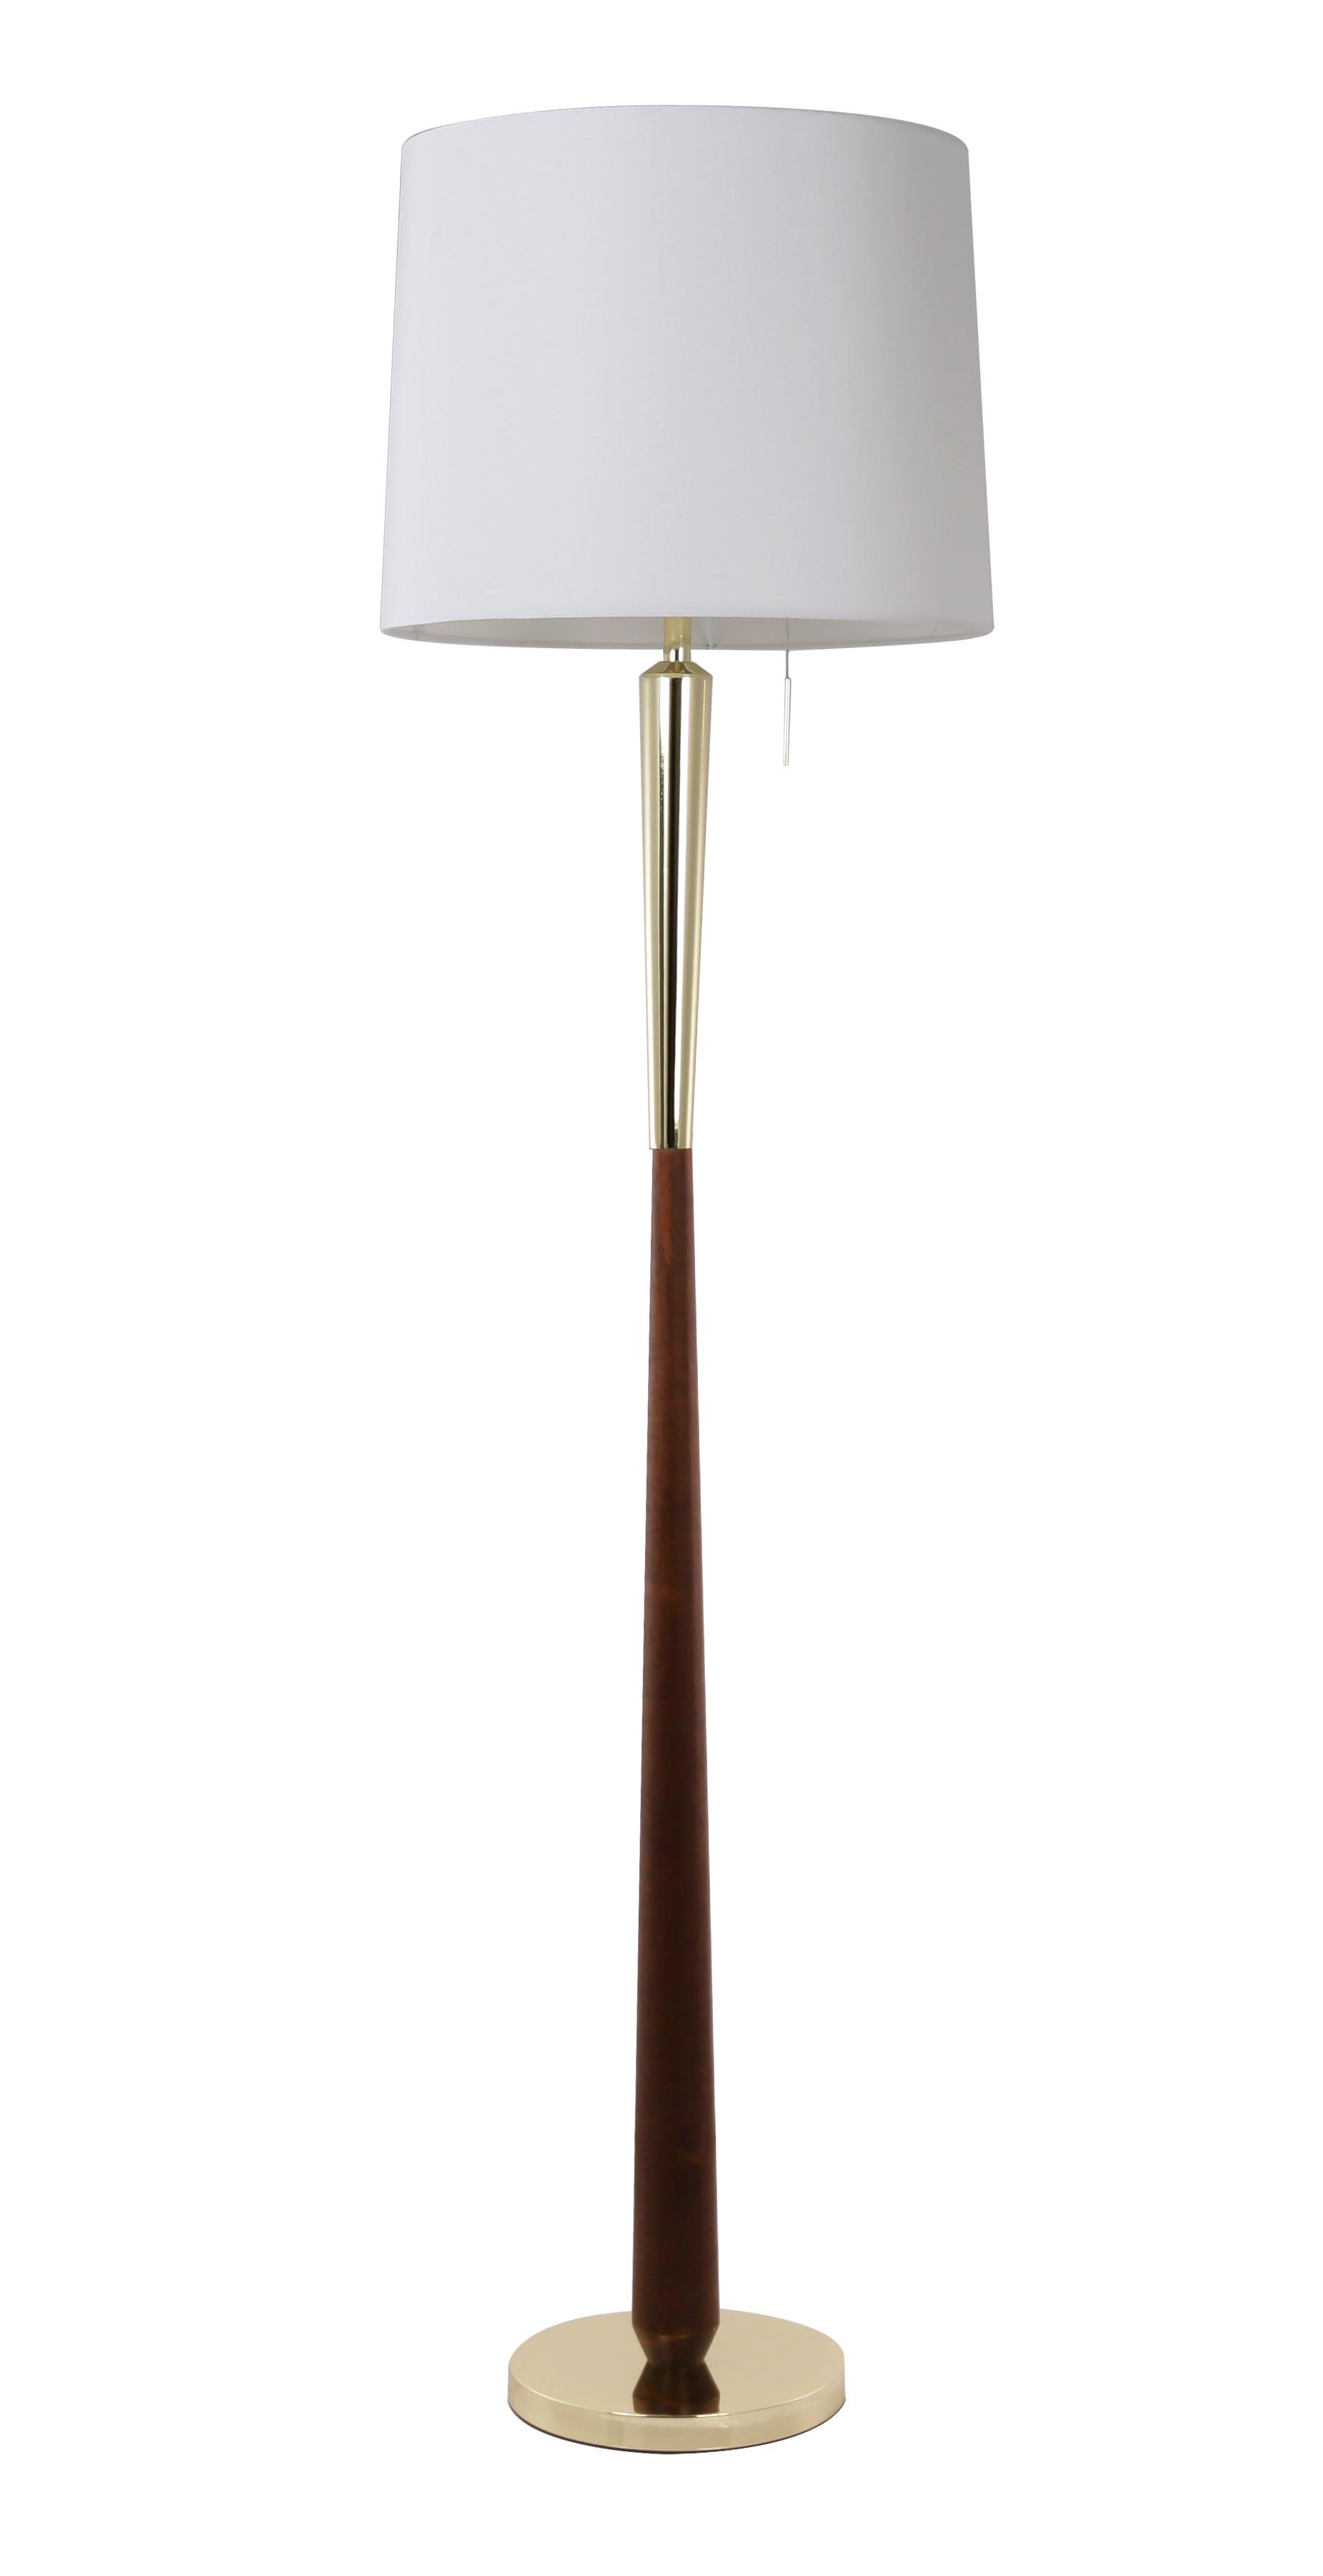 30003647 Percy Floor Lamp.jpg